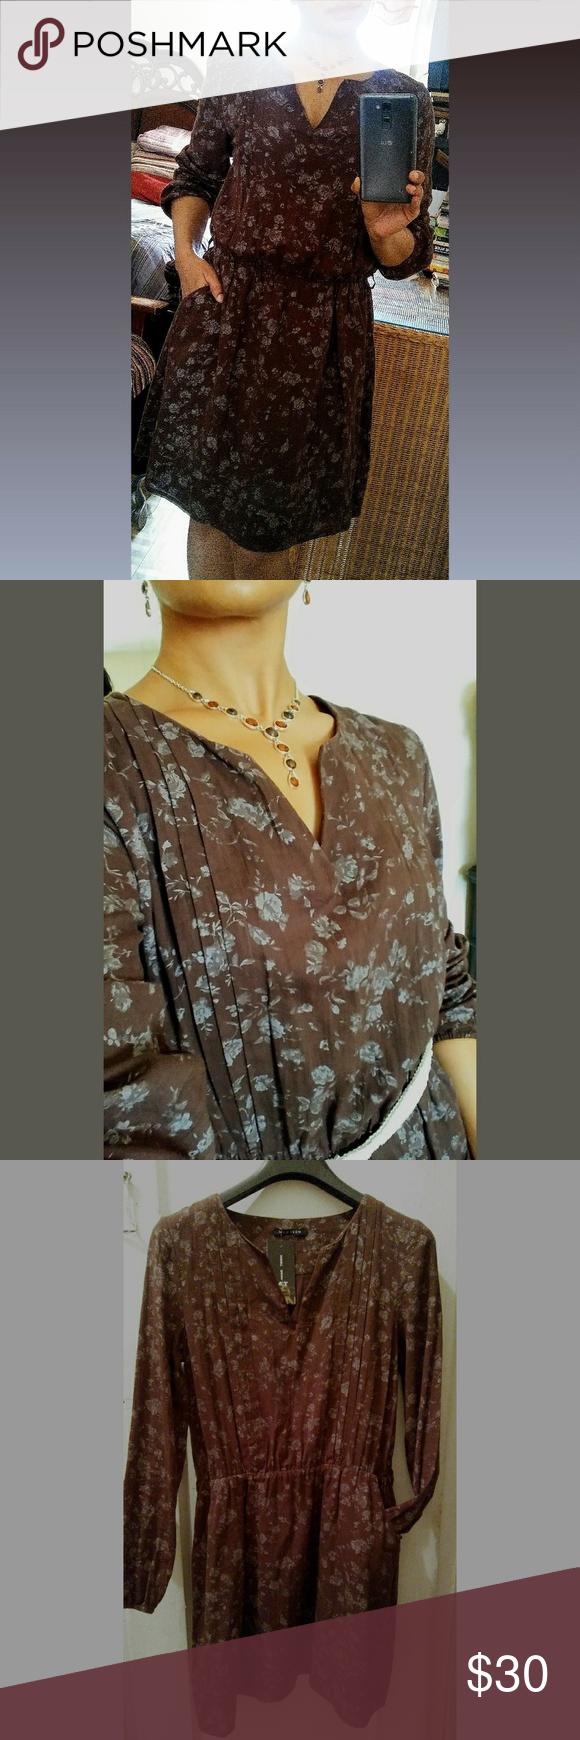 Hp hickory dress w silver flowersbonus belt collar dress